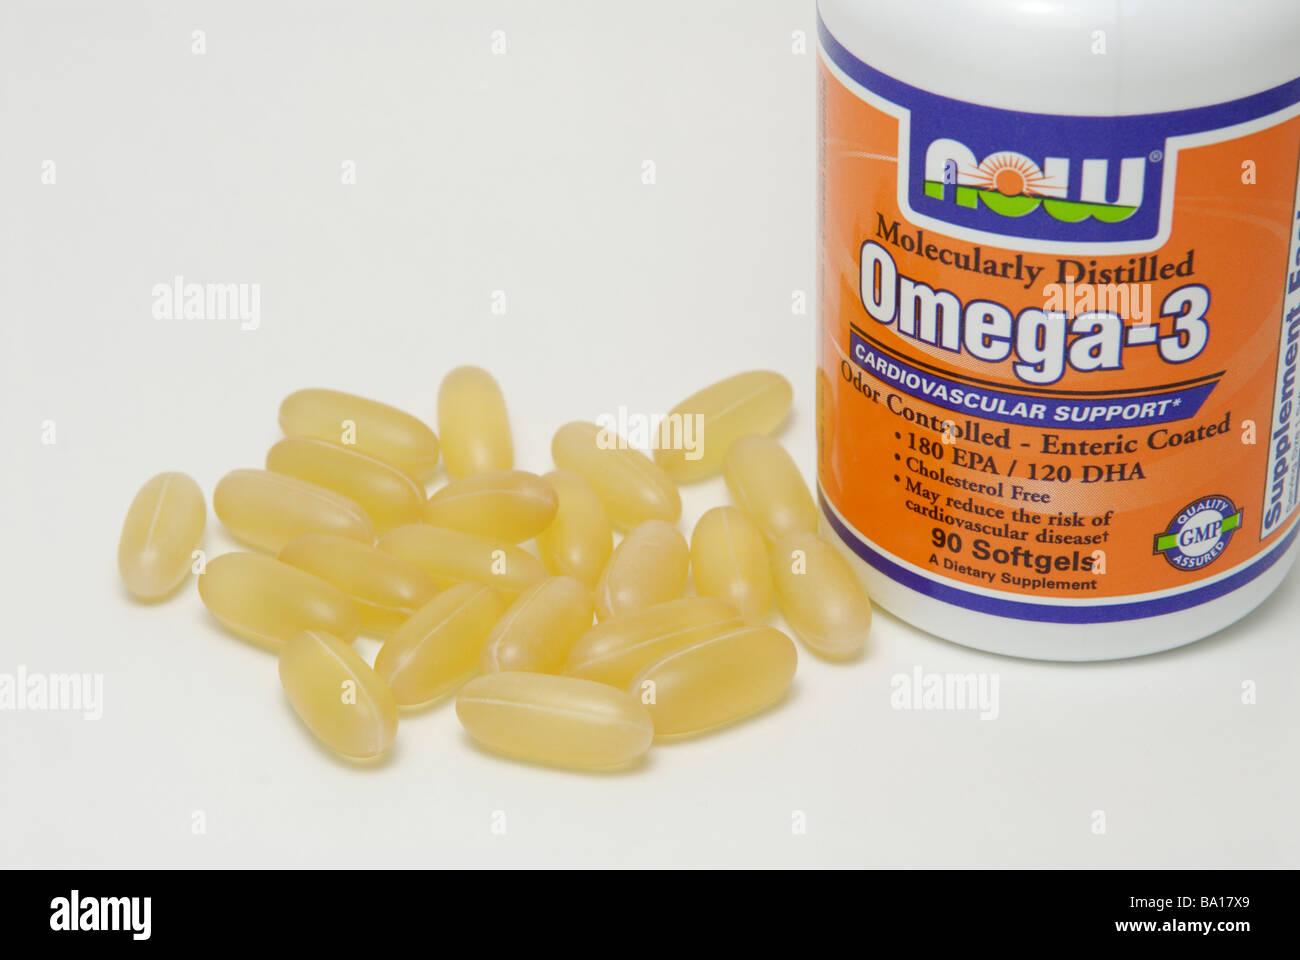 Fish oil gelatin capsules for supplementation of Omega 3 omega-3 fatty acids - Stock Image